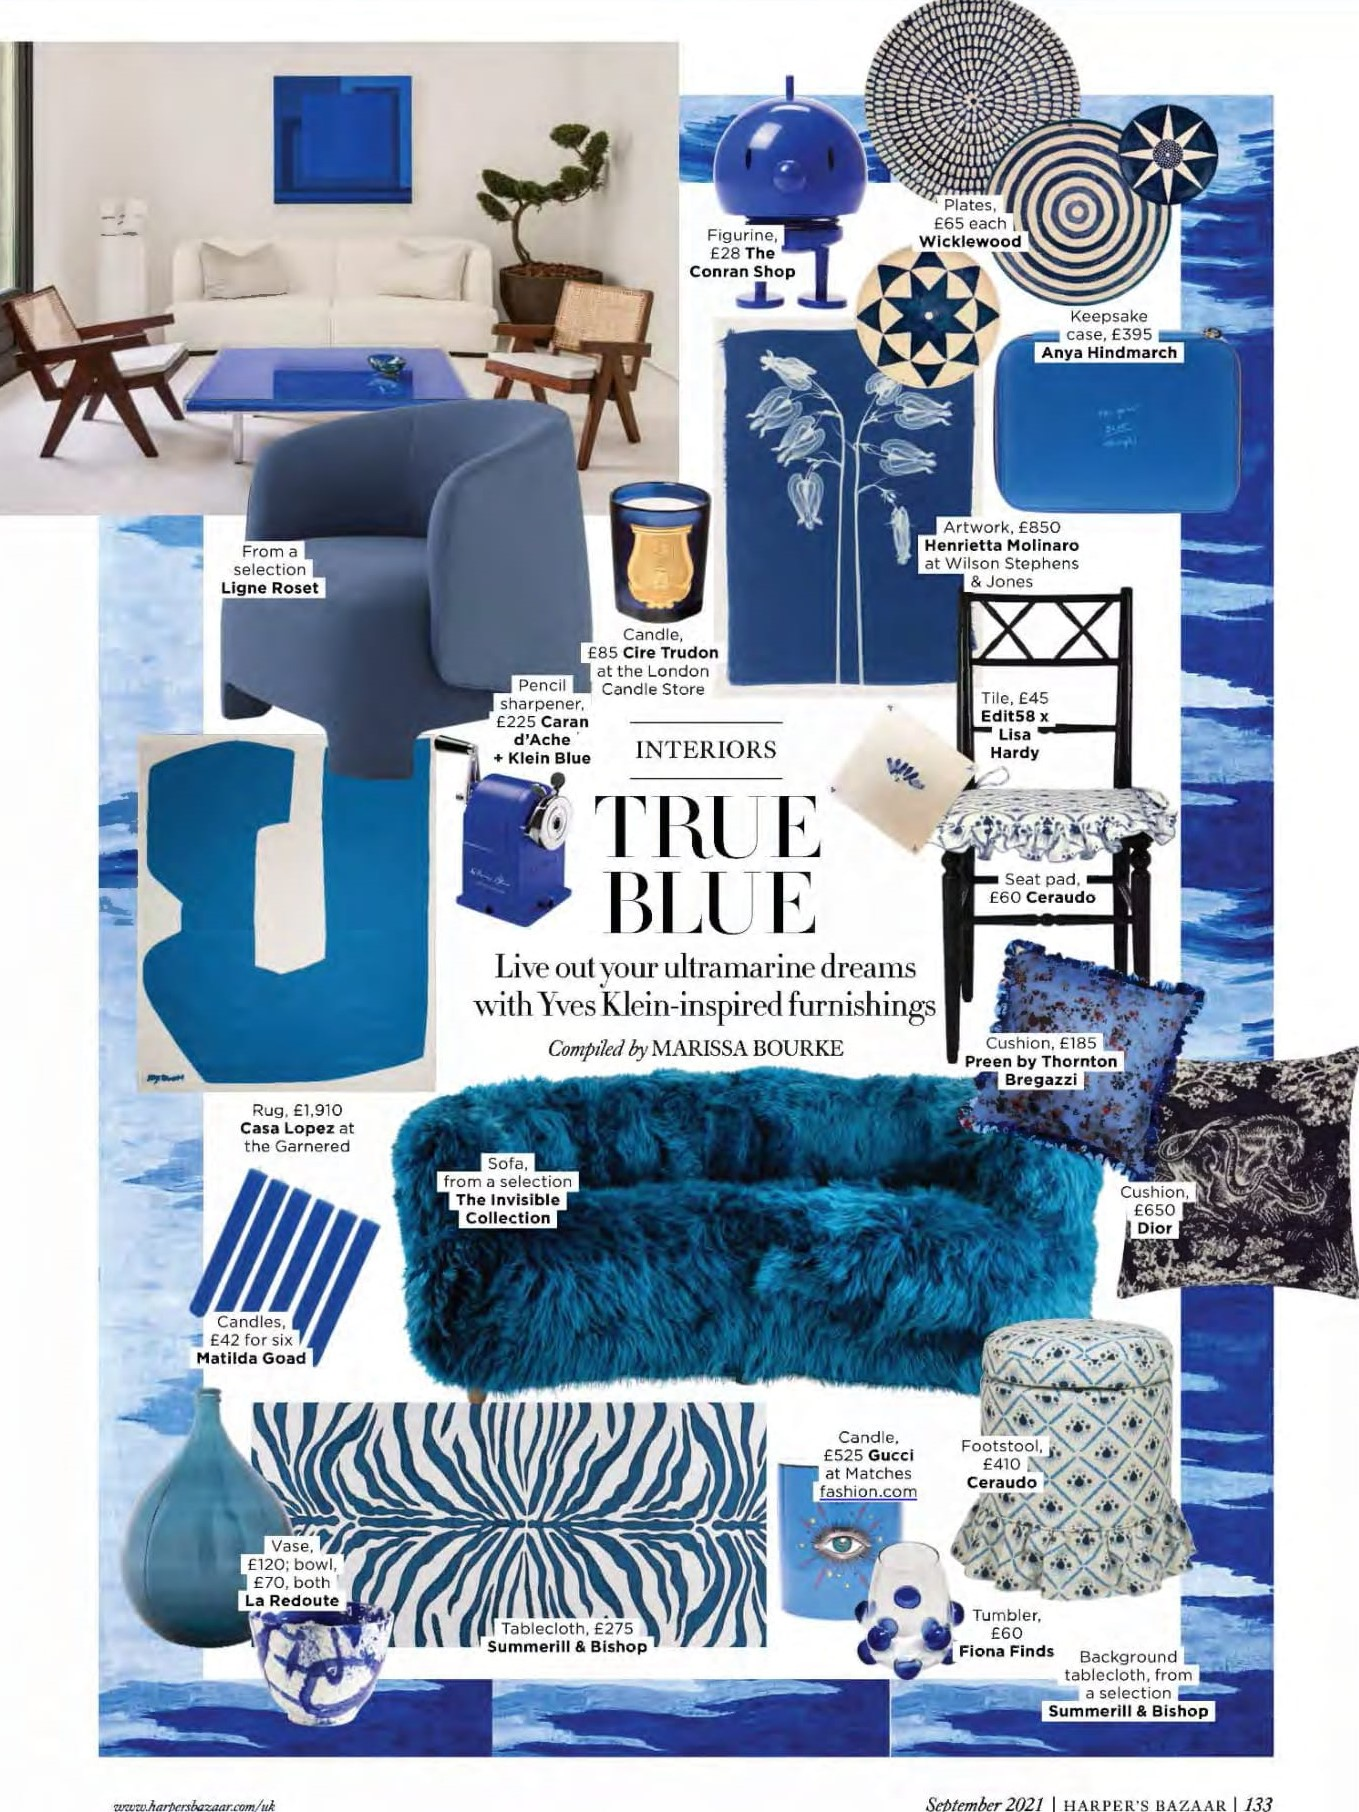 Harper's Bazaar are living out their ultramarine dreams with Ligne Roset's Taru armchair